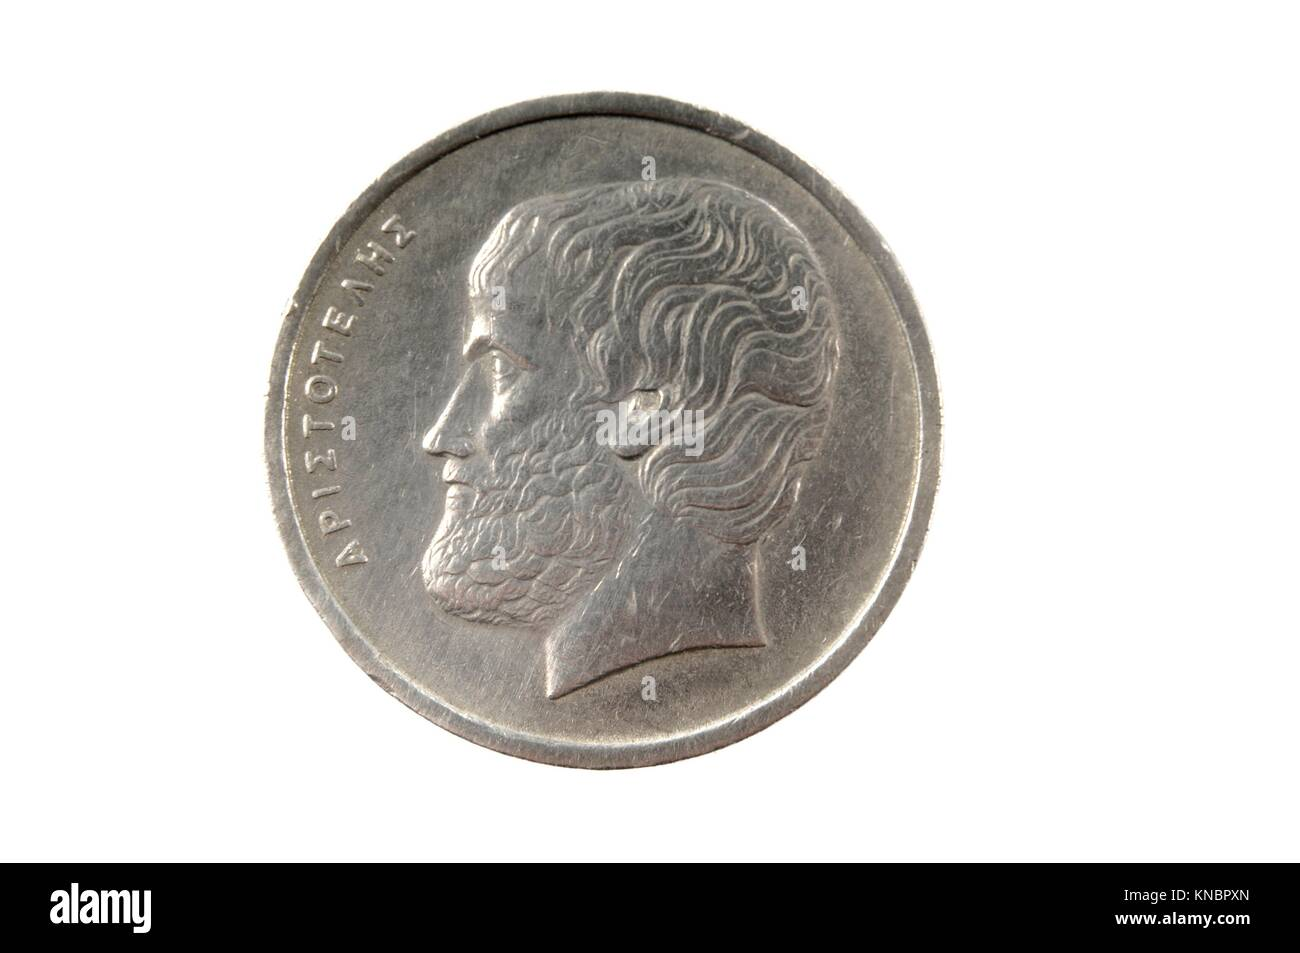 Greek Drachma Coin, 5 drachmas. - Stock Image